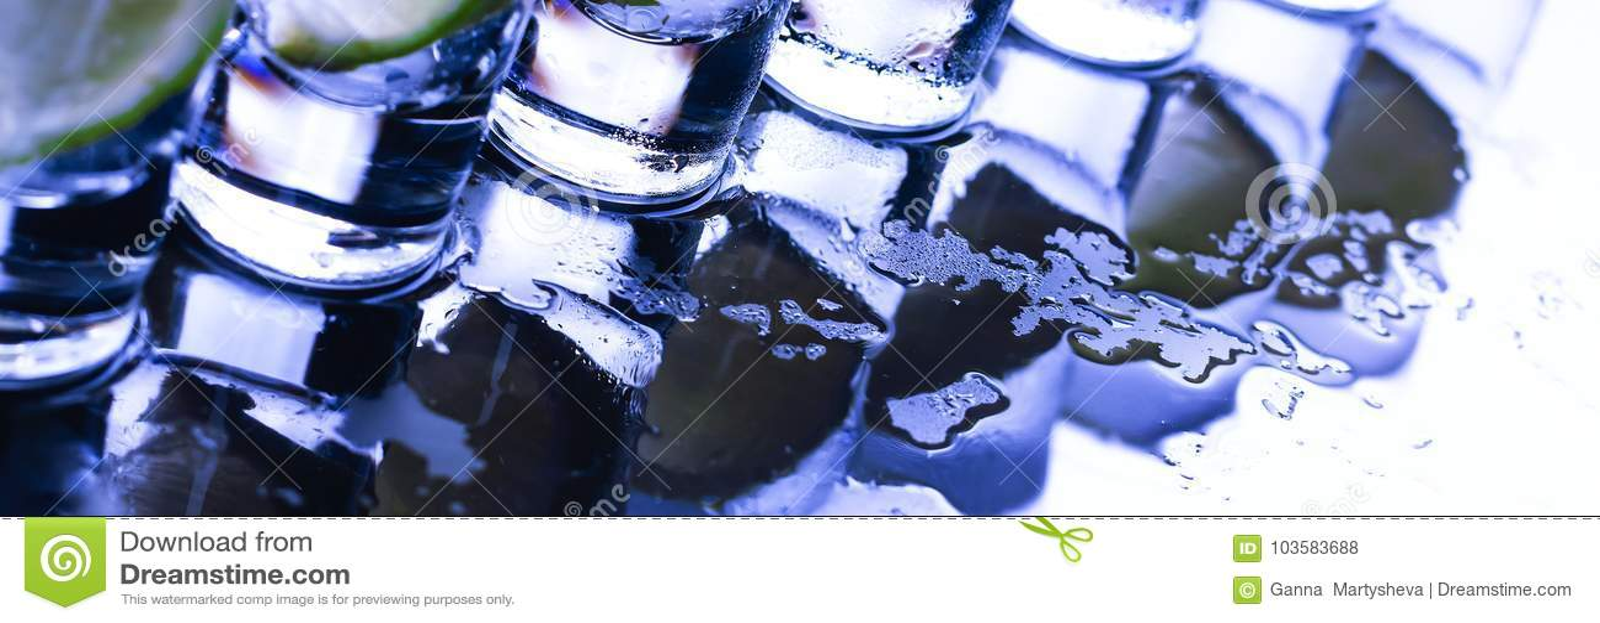 Buffed Много стекла с спиртным коктеилем